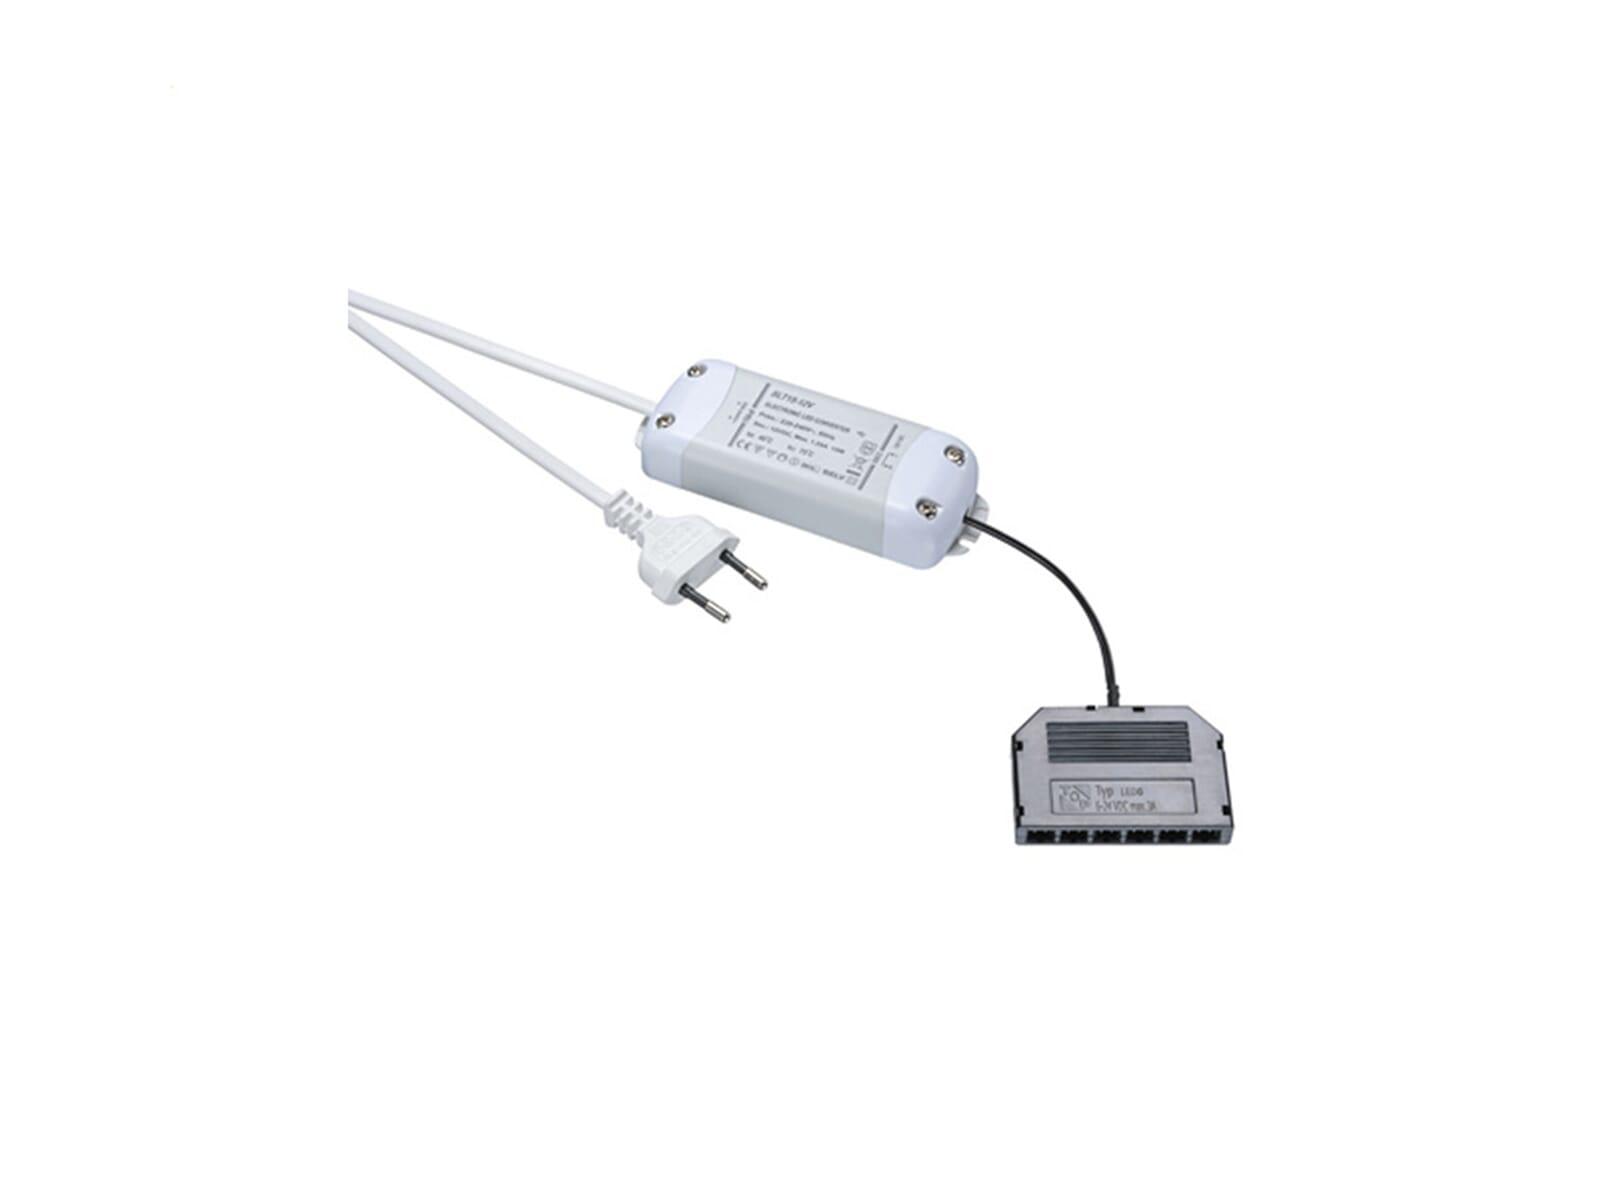 Thebo - 29009 DC LED Netzteil 15 Watt/DC